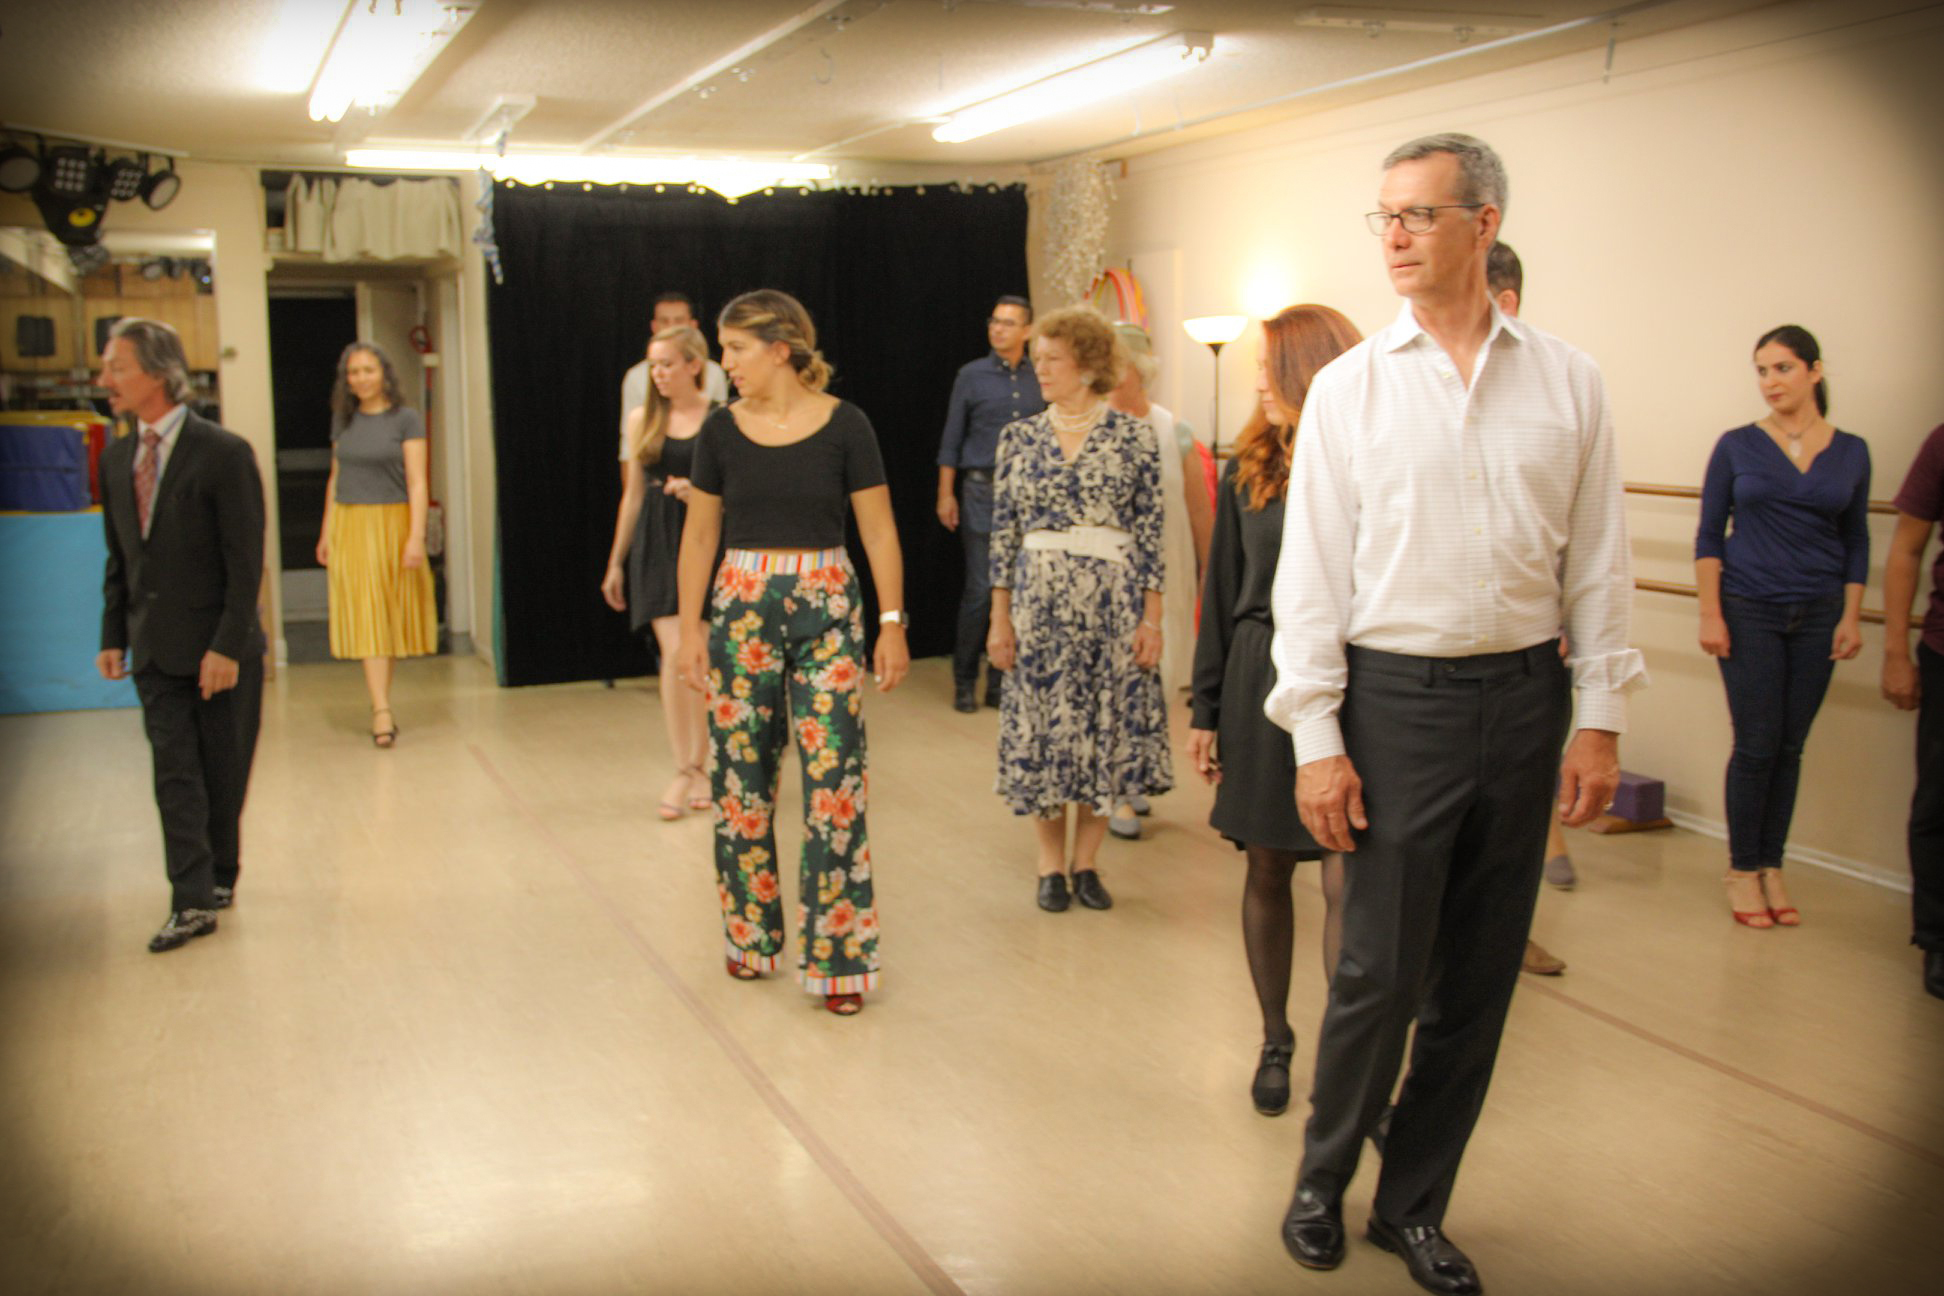 Learn to dance Argentine Tango at Escuela de Tango de Buenos Aires.